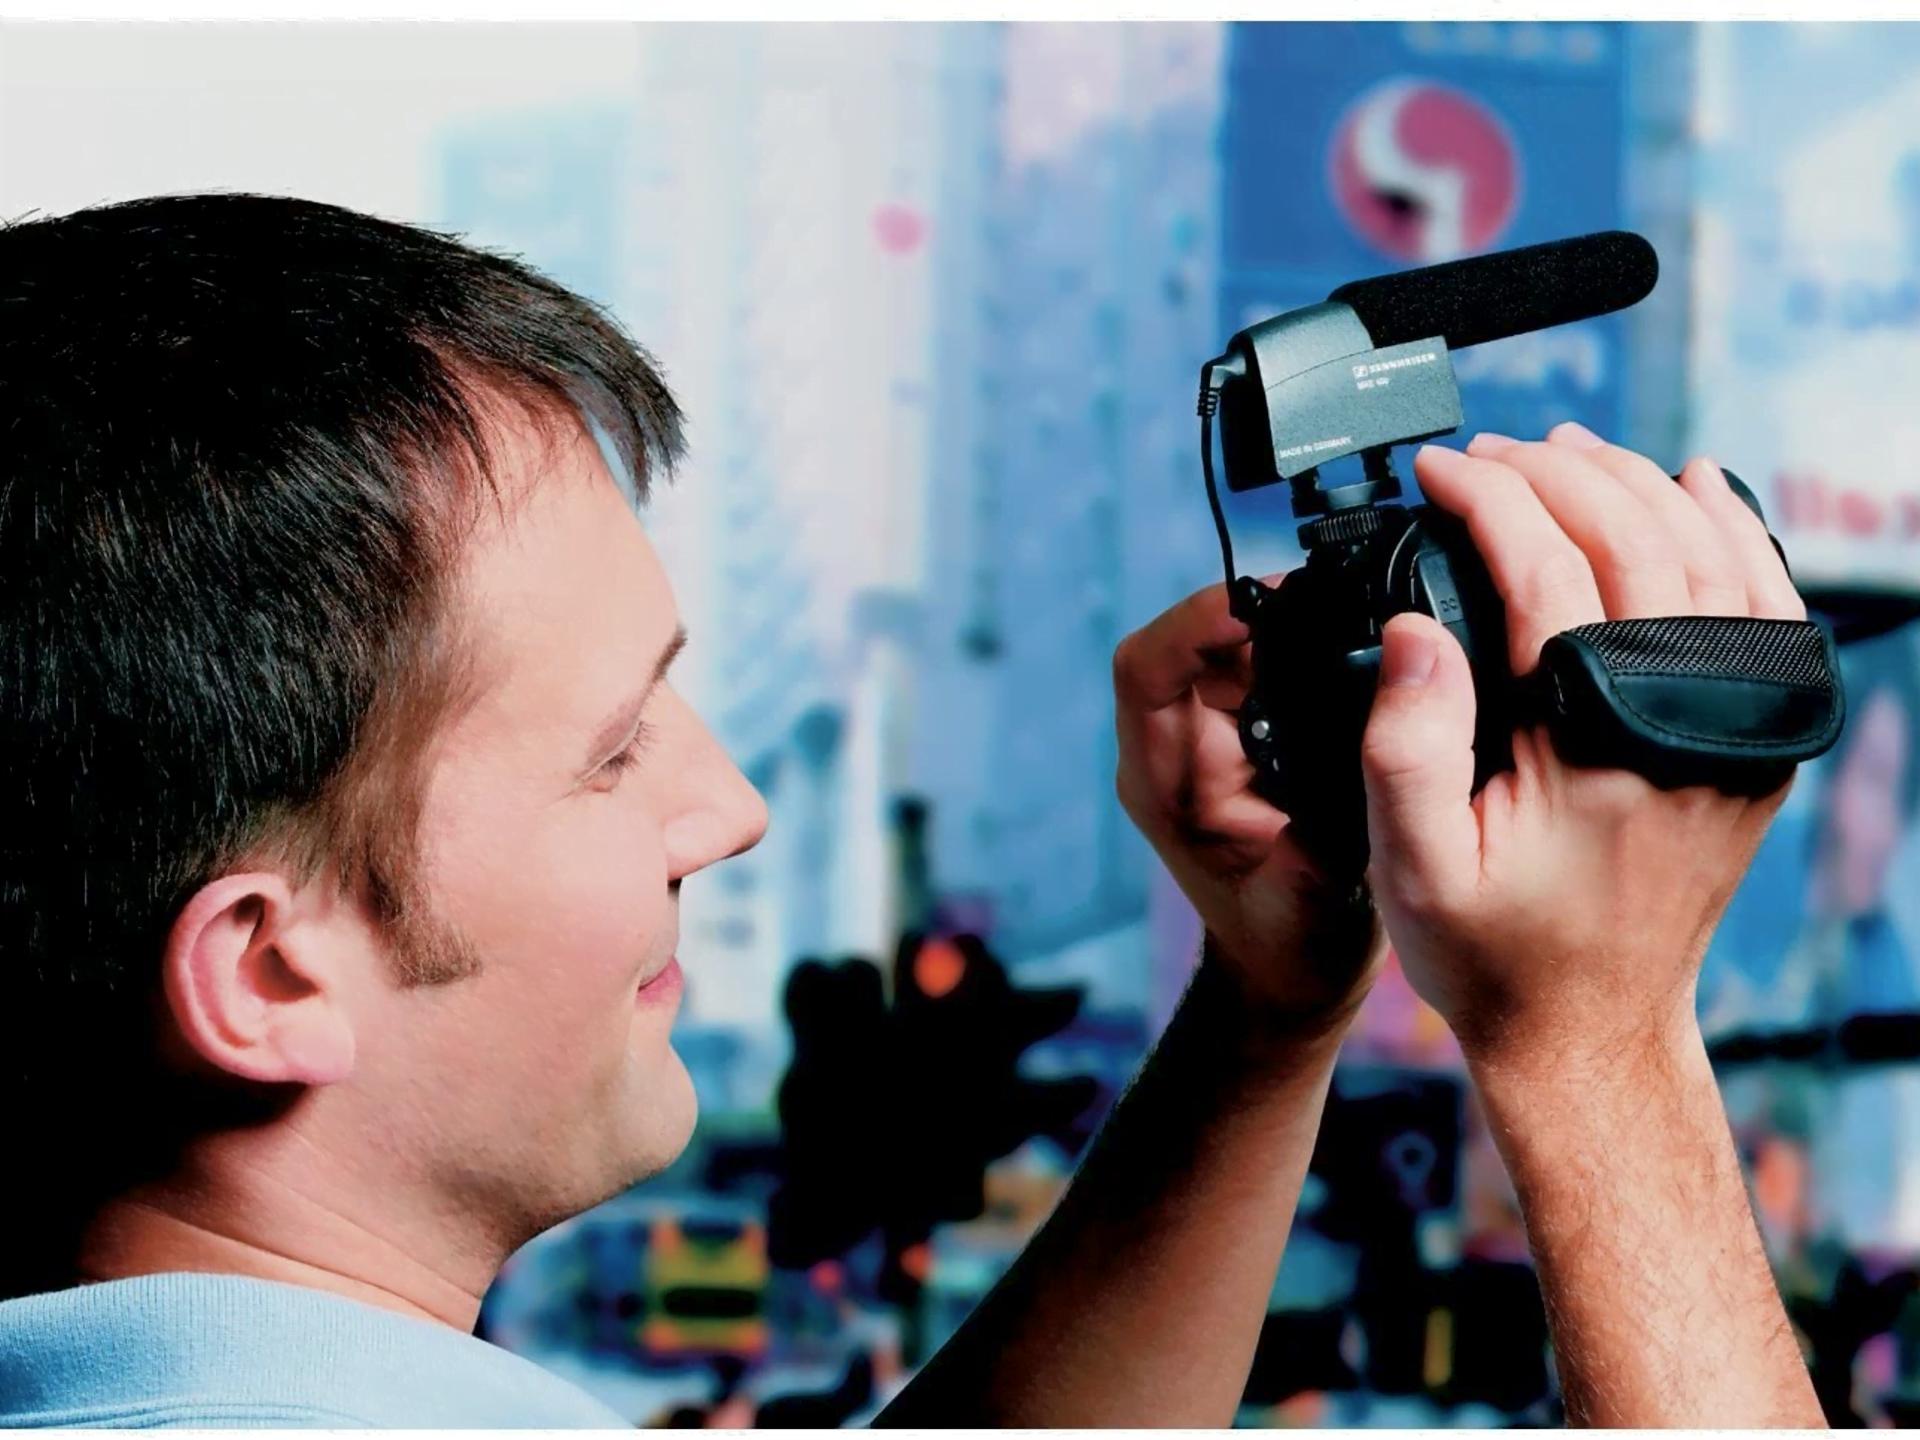 Sennheiser MKE 400 Shotgun Microphone review: The Best In-Camera Microphone